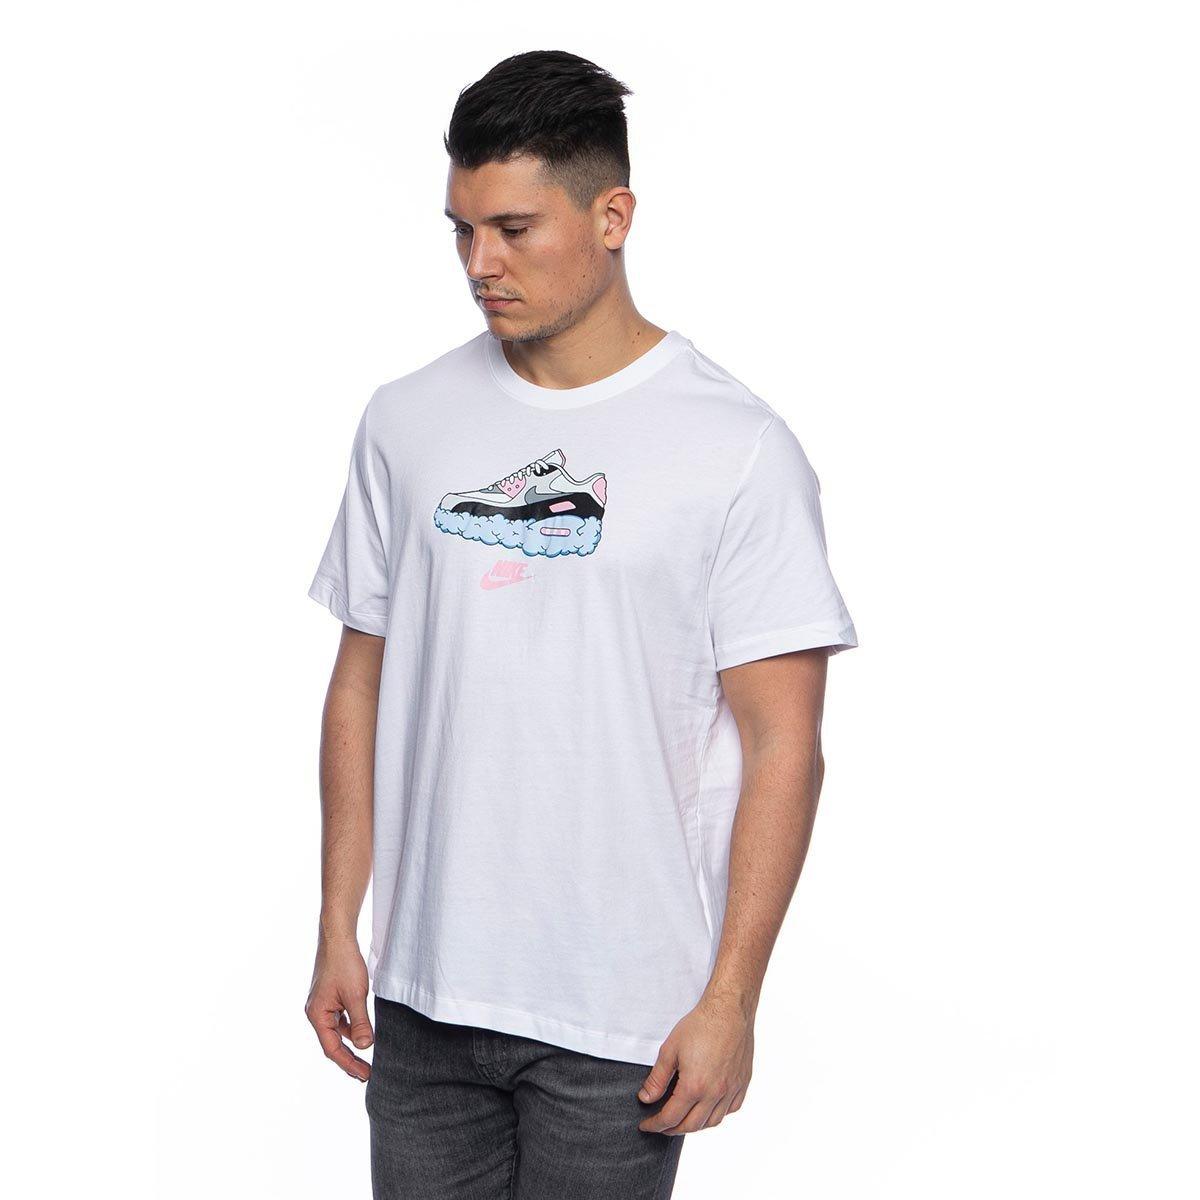 Koszulka Nike Air Max 90 T shirt white ▷ Kup online na